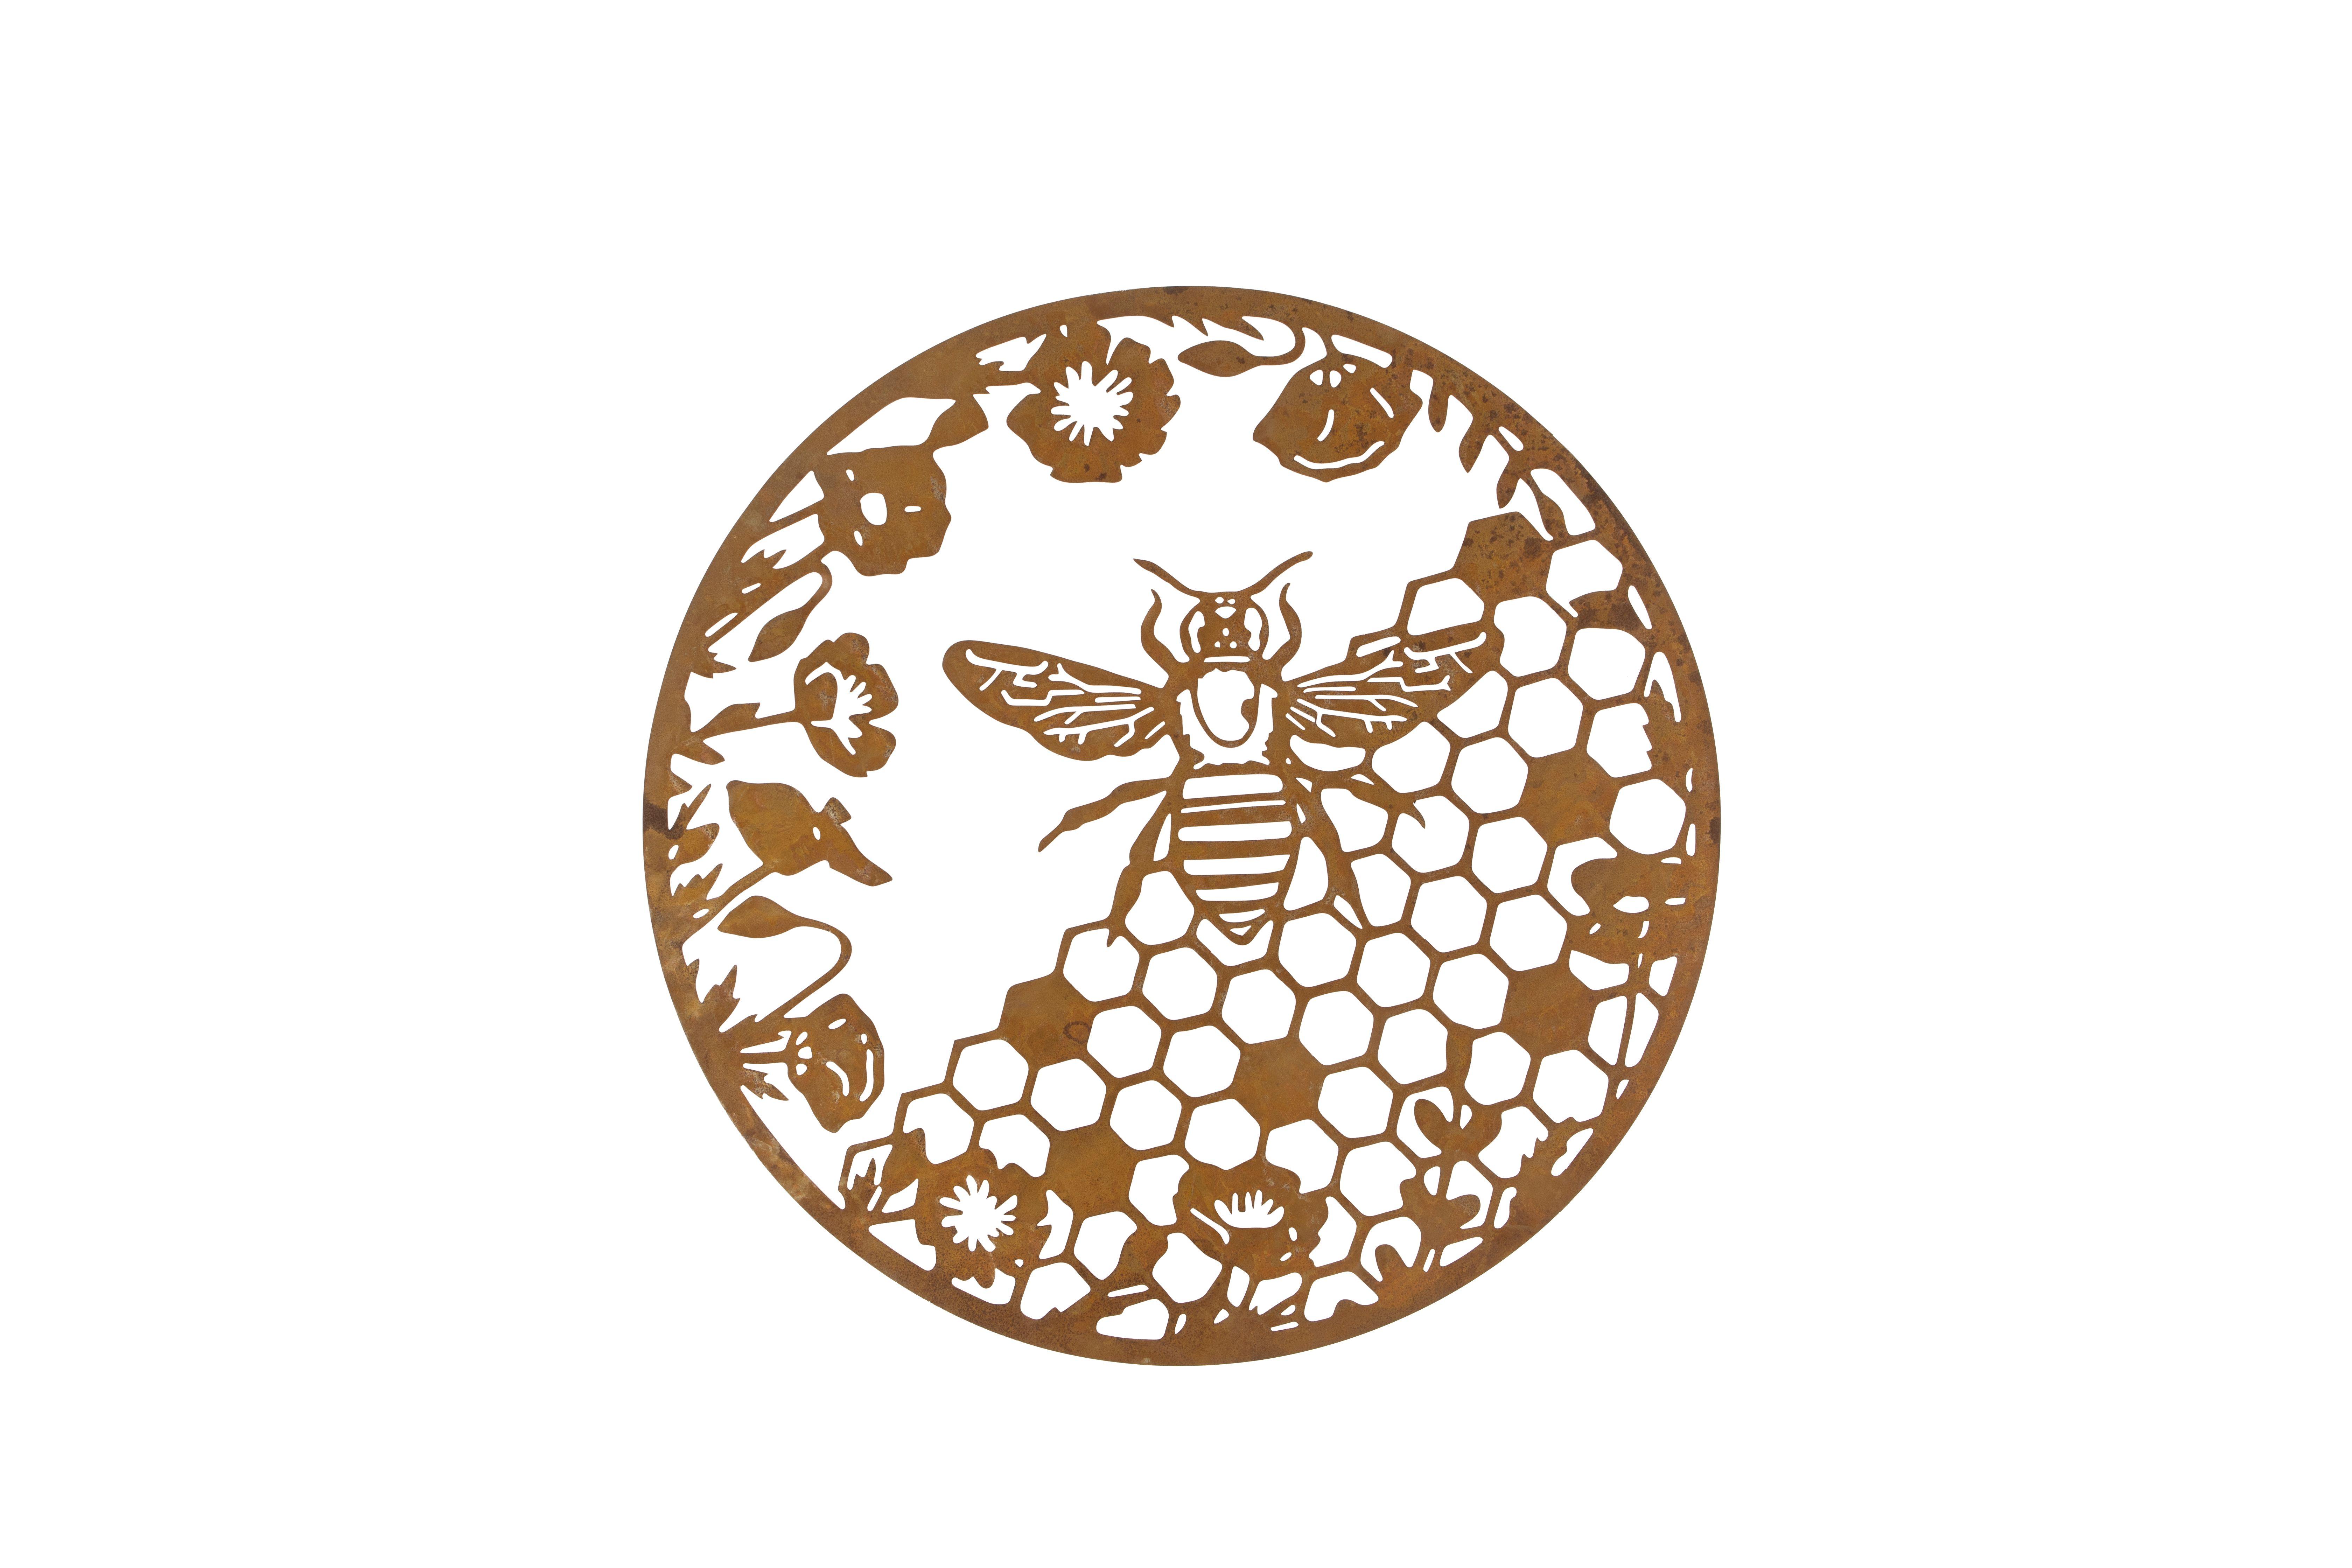 London Ornaments Honeycomb Garden Wall Plaque